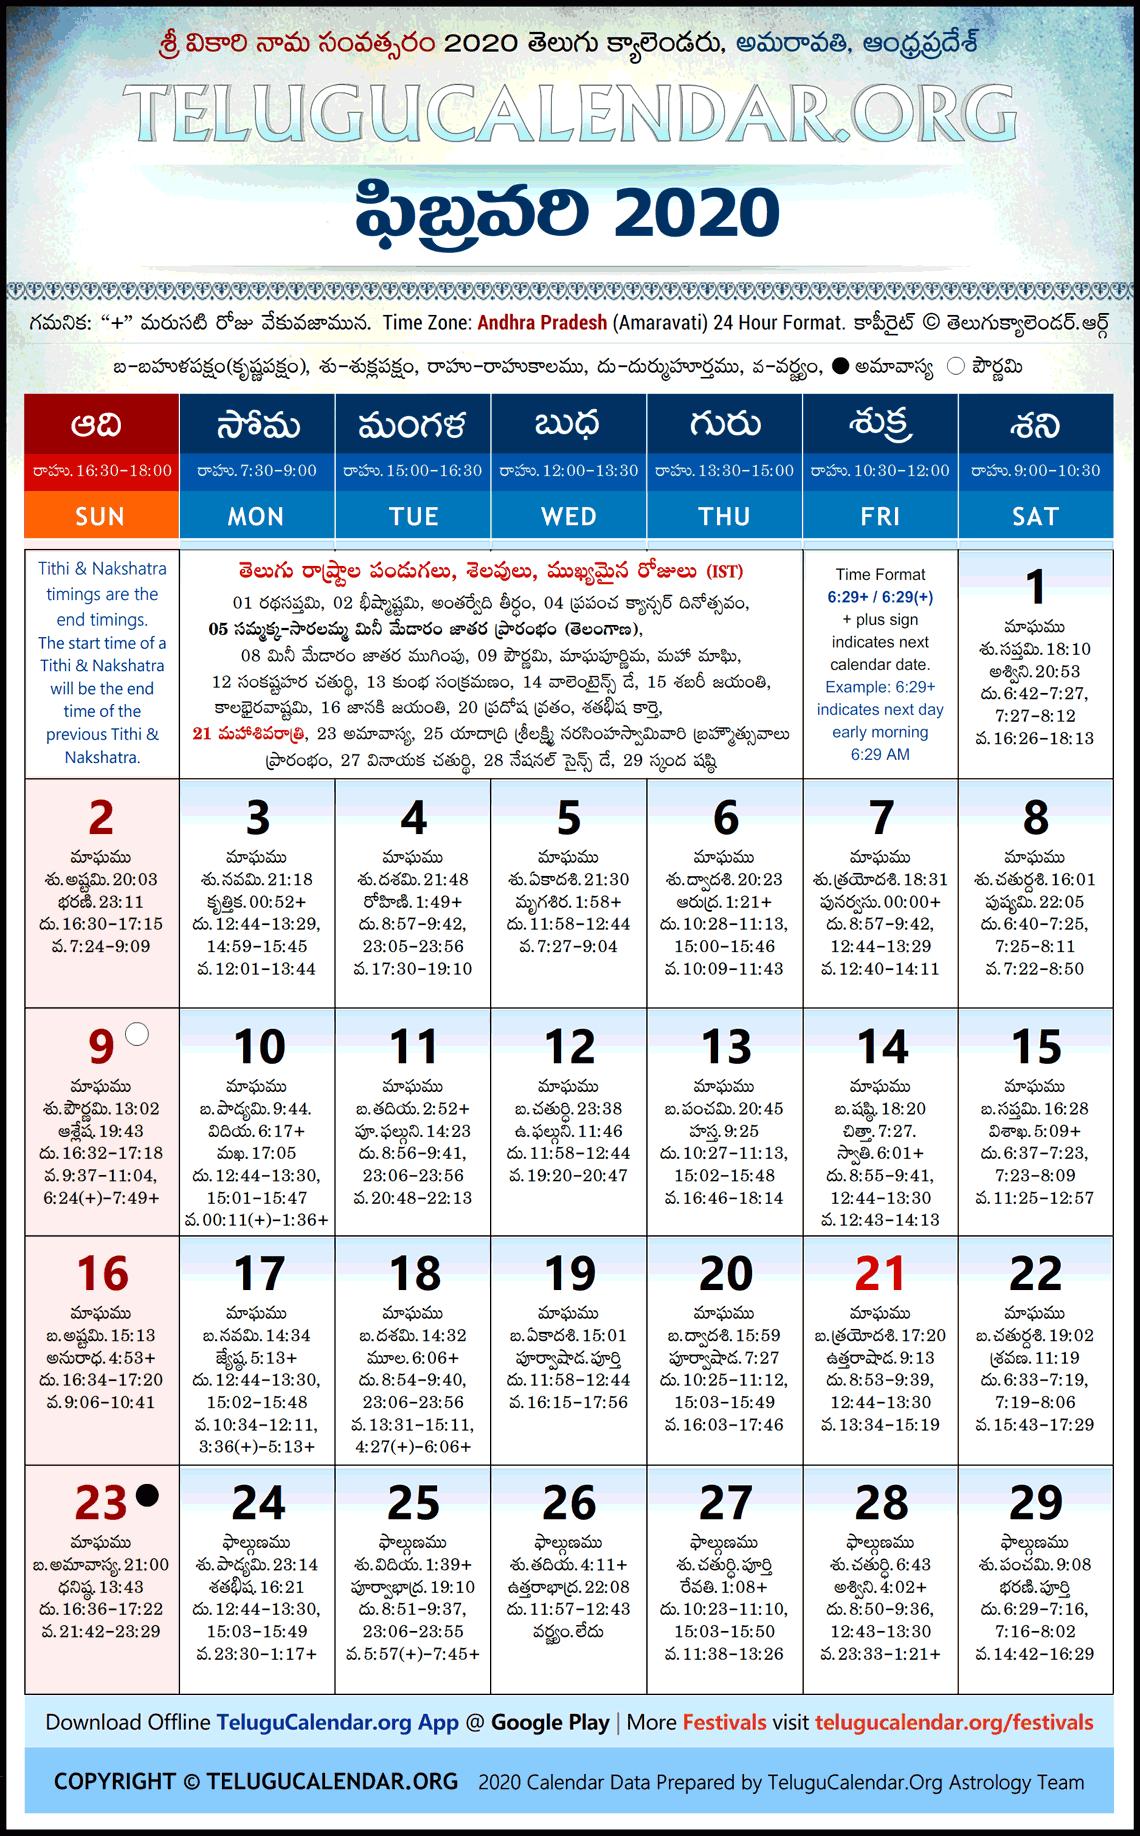 Andhra Pradesh | 2020 February Telugu Calendar High Resolution